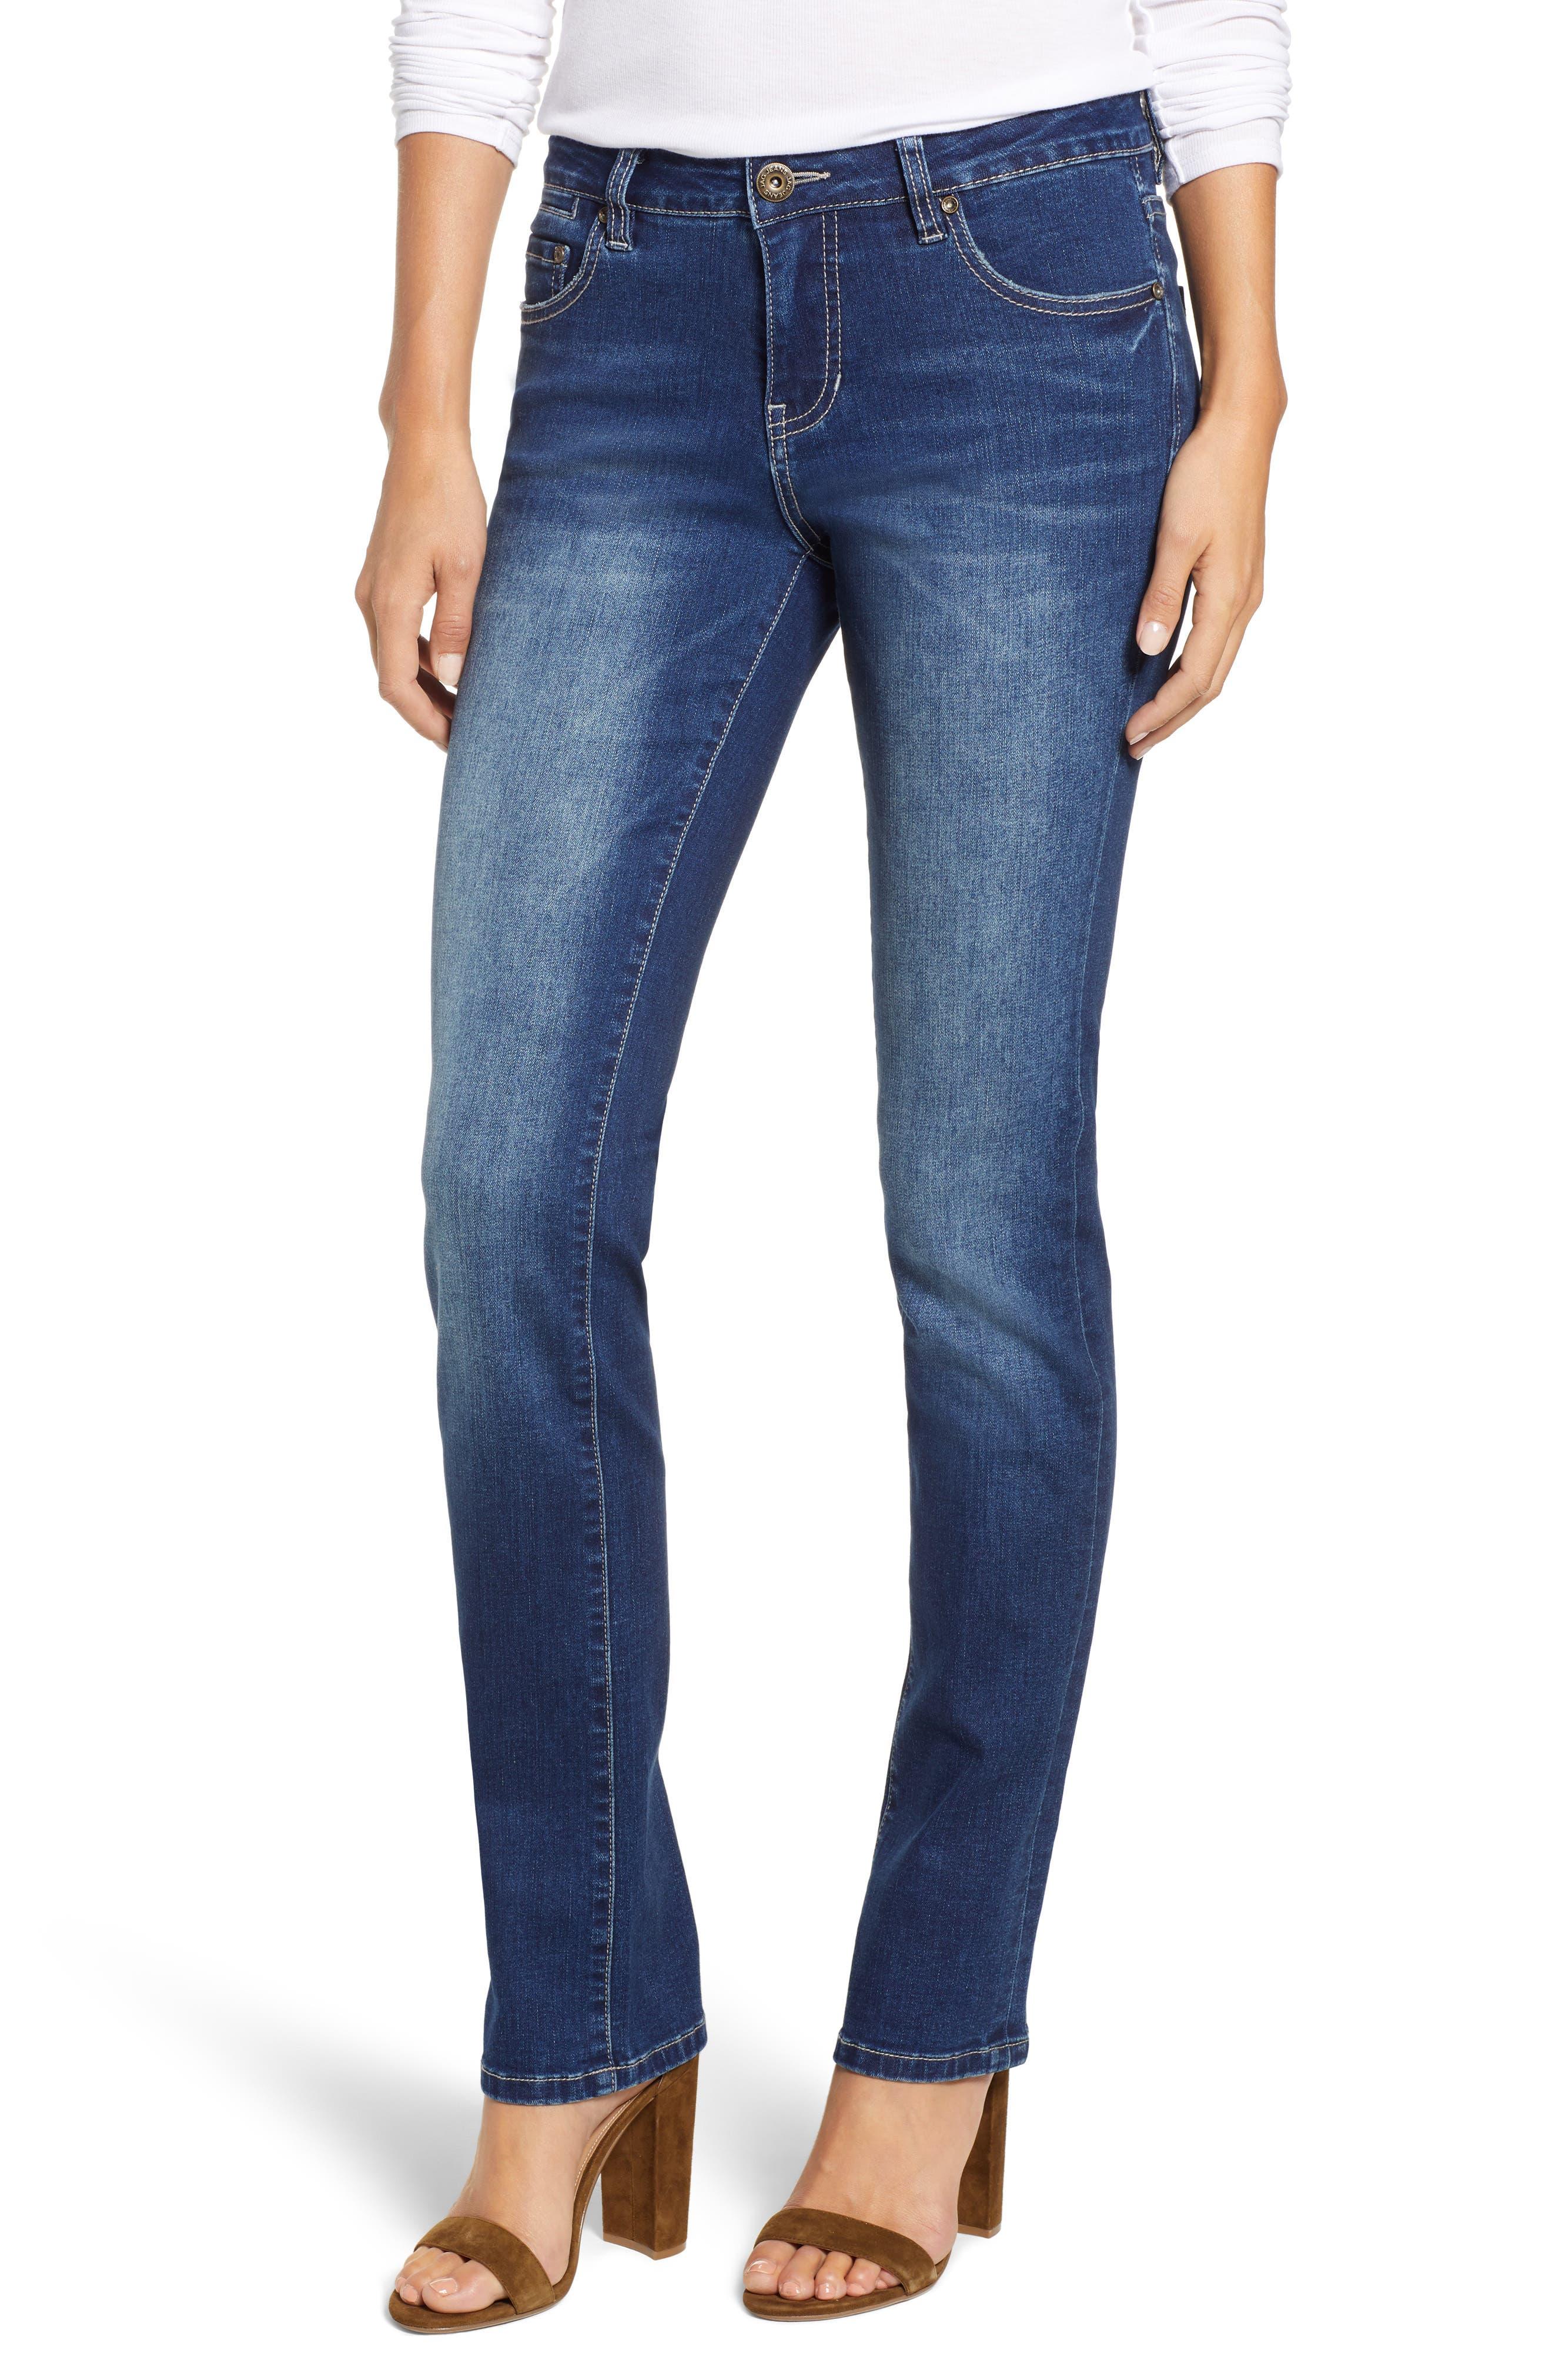 JAG JEANS Hanna Stretch Straight Leg Jeans, Main, color, MED INDIGO